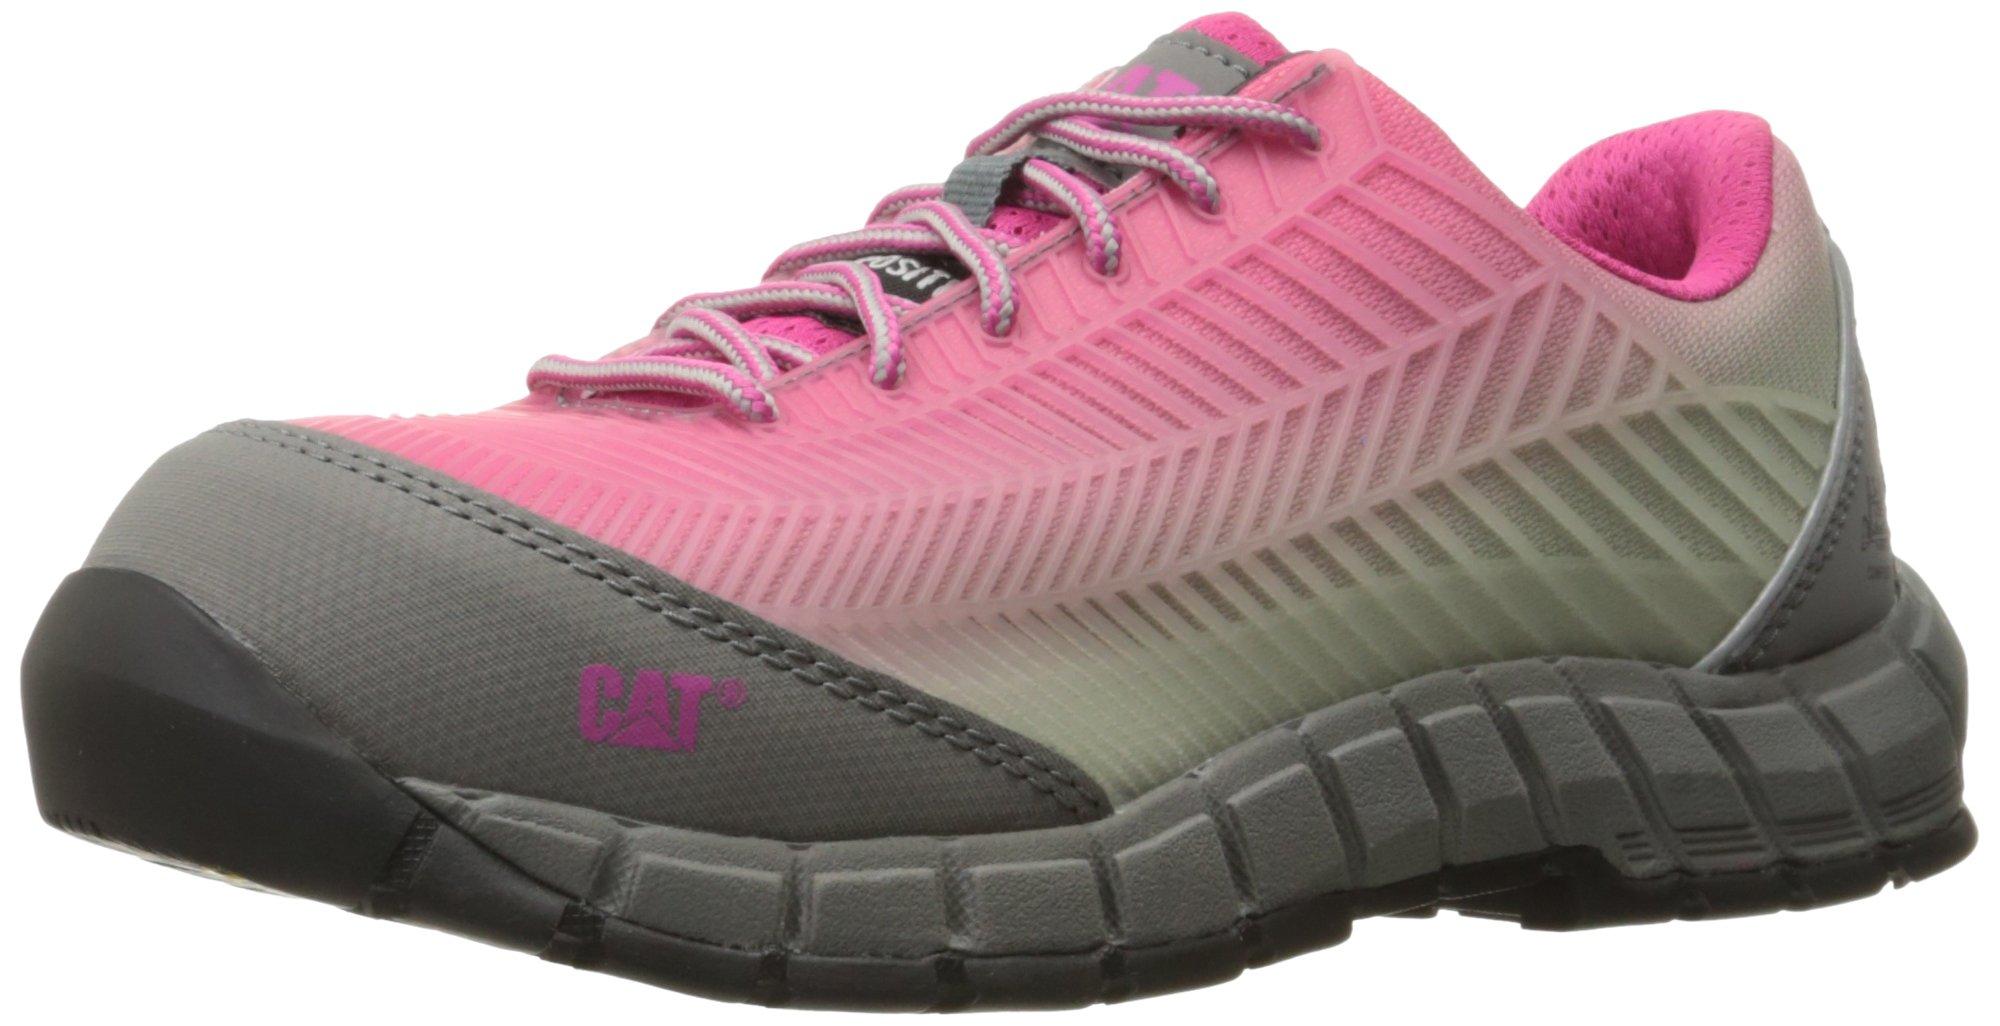 Caterpillar Women's Array Comp Toe Work Shoe, Pink, 8 M US